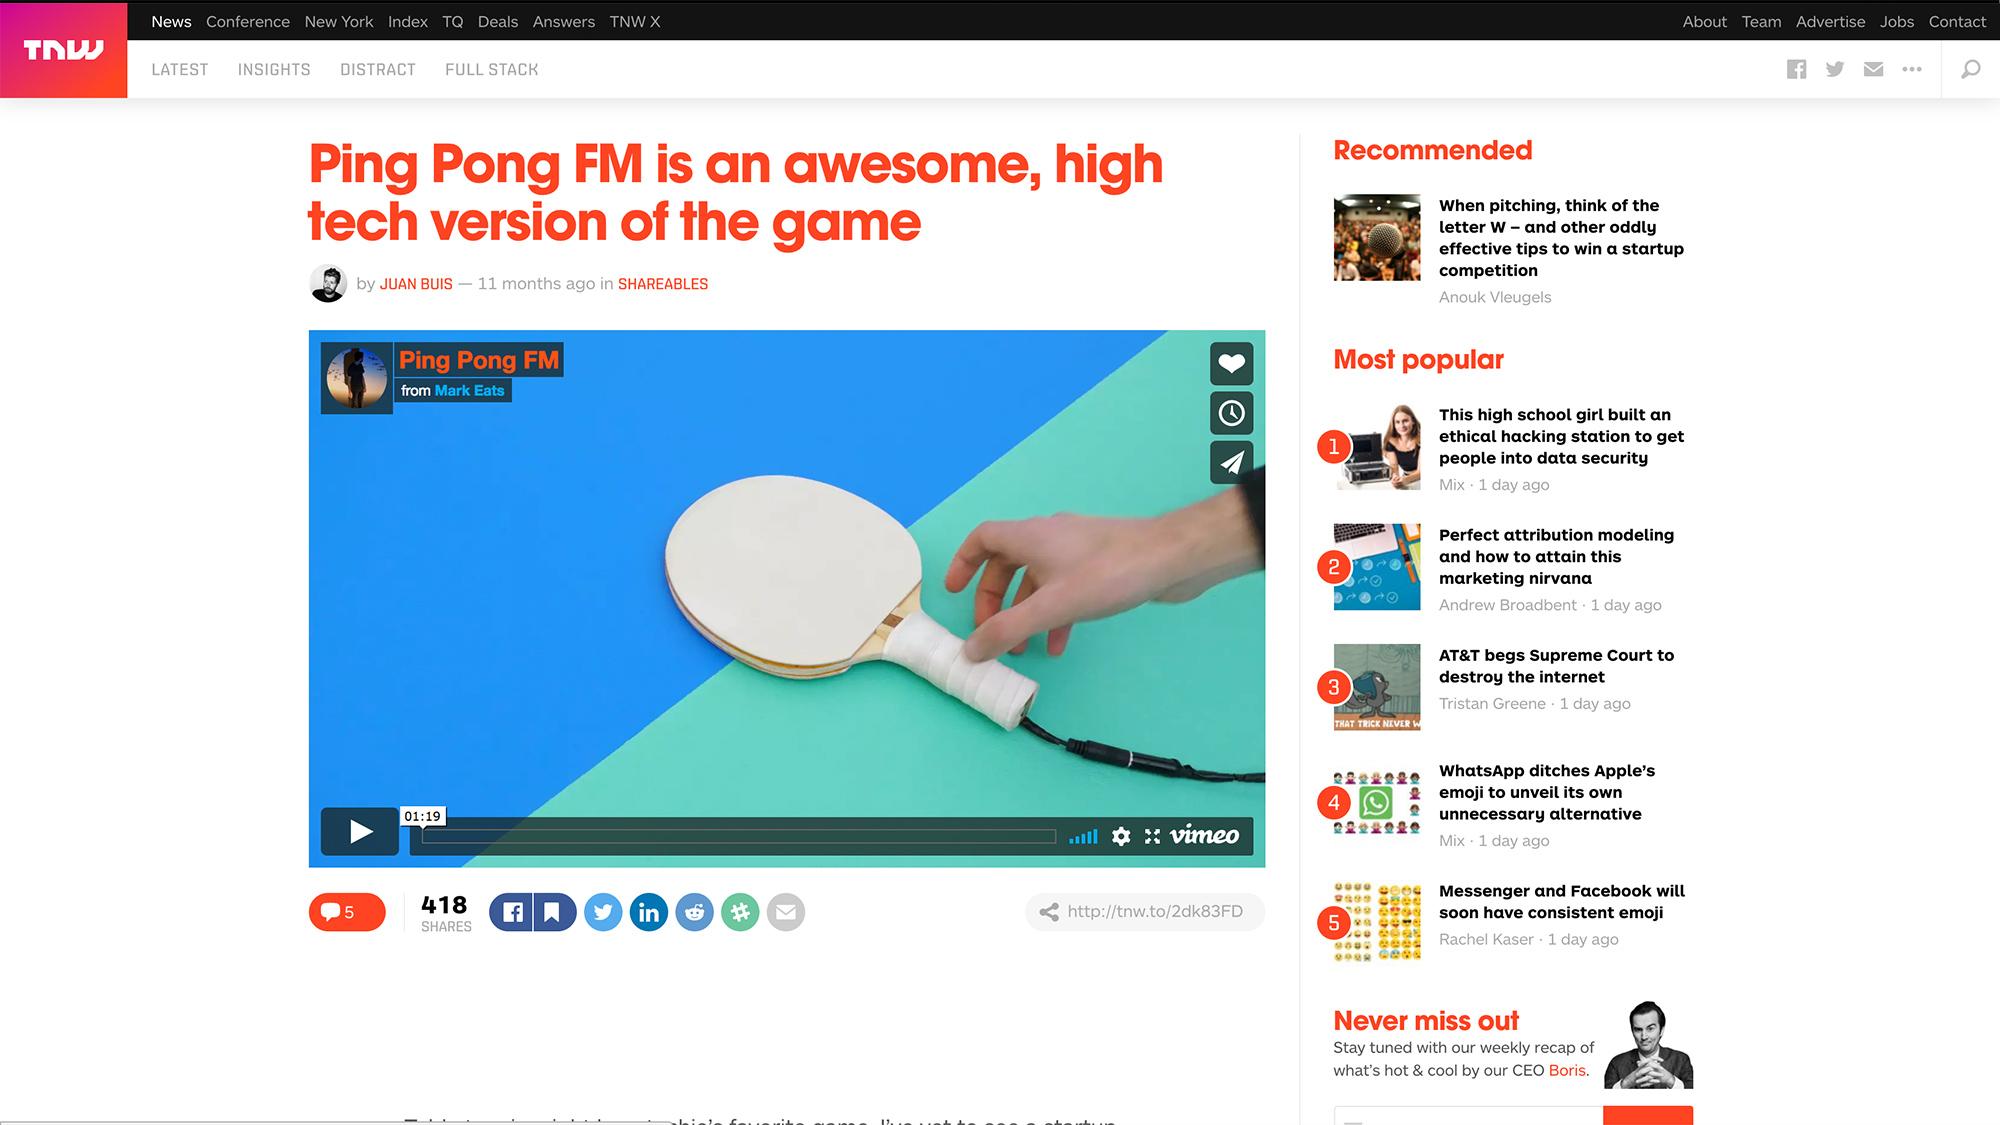 PingPongFM_Press_TNW.jpg